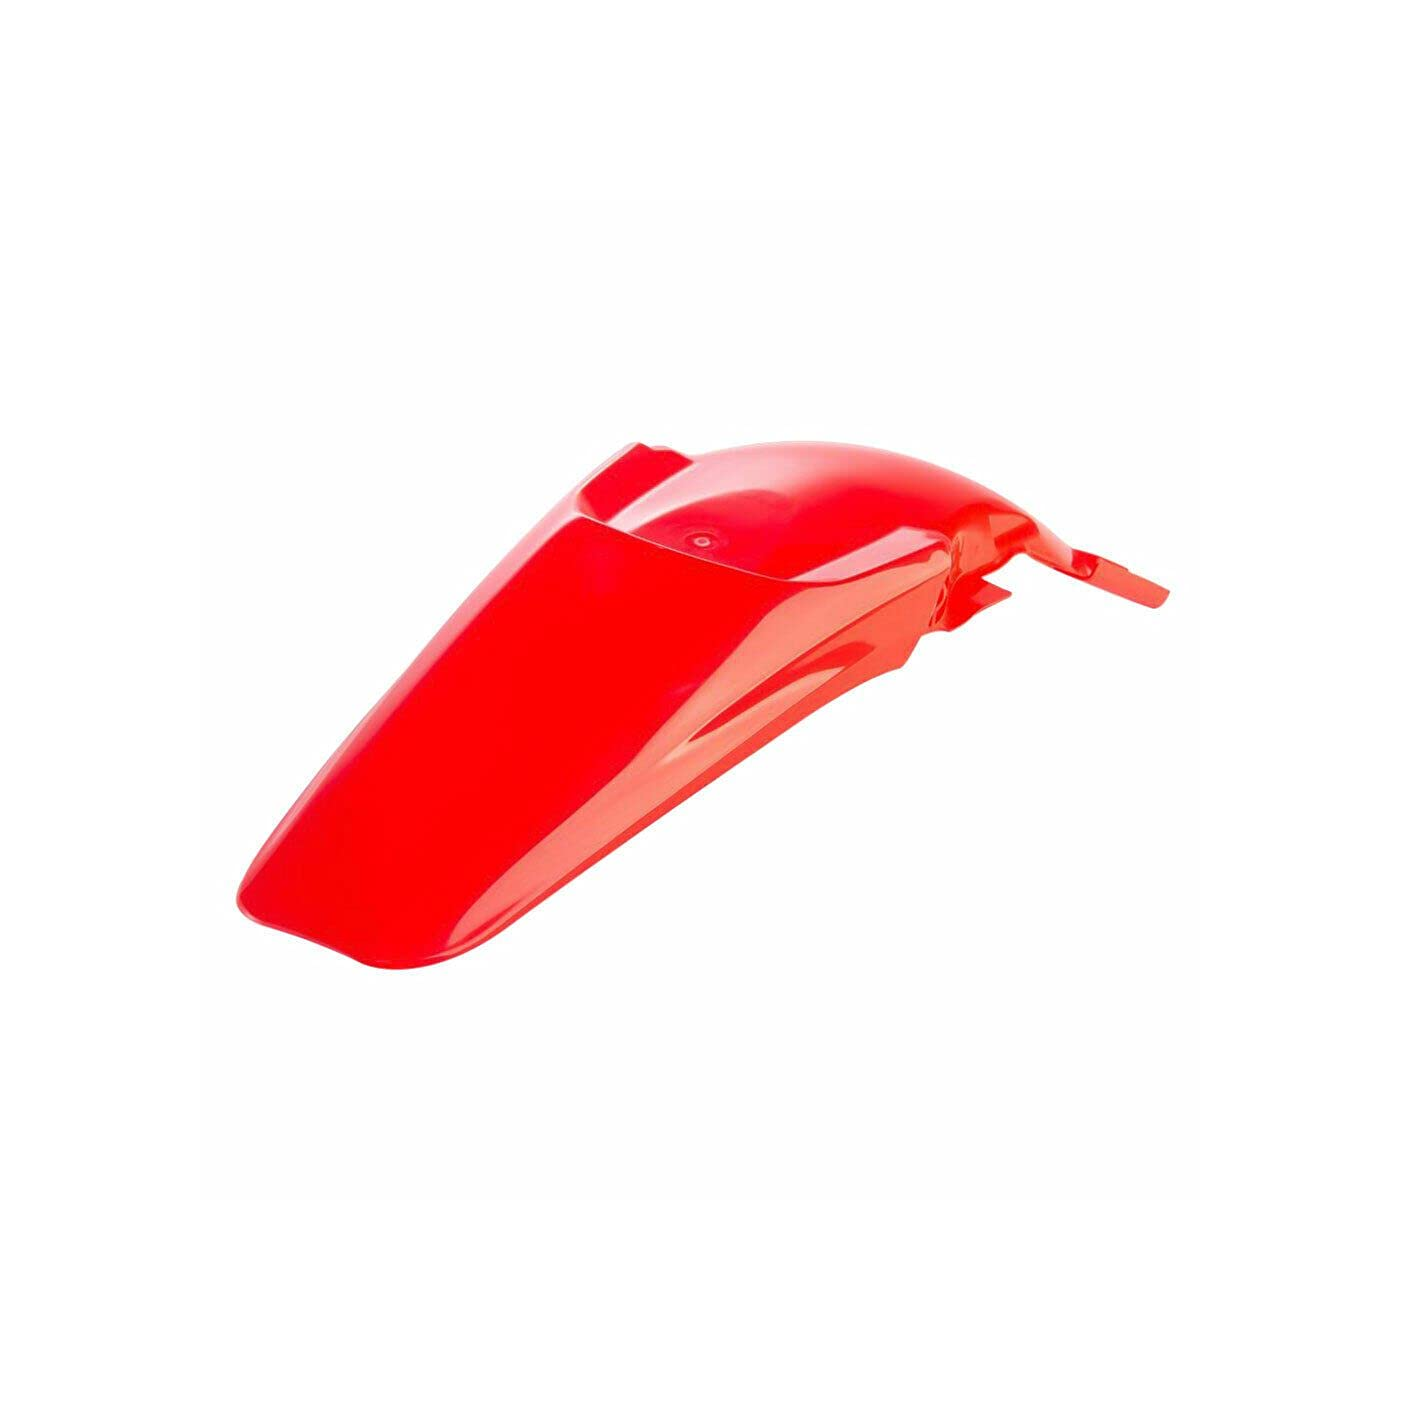 forAcerbis Rear Fender 2000 CR Ranking TOP3 Regular discount Red 200 Hondaa CRforF150R - Fits: